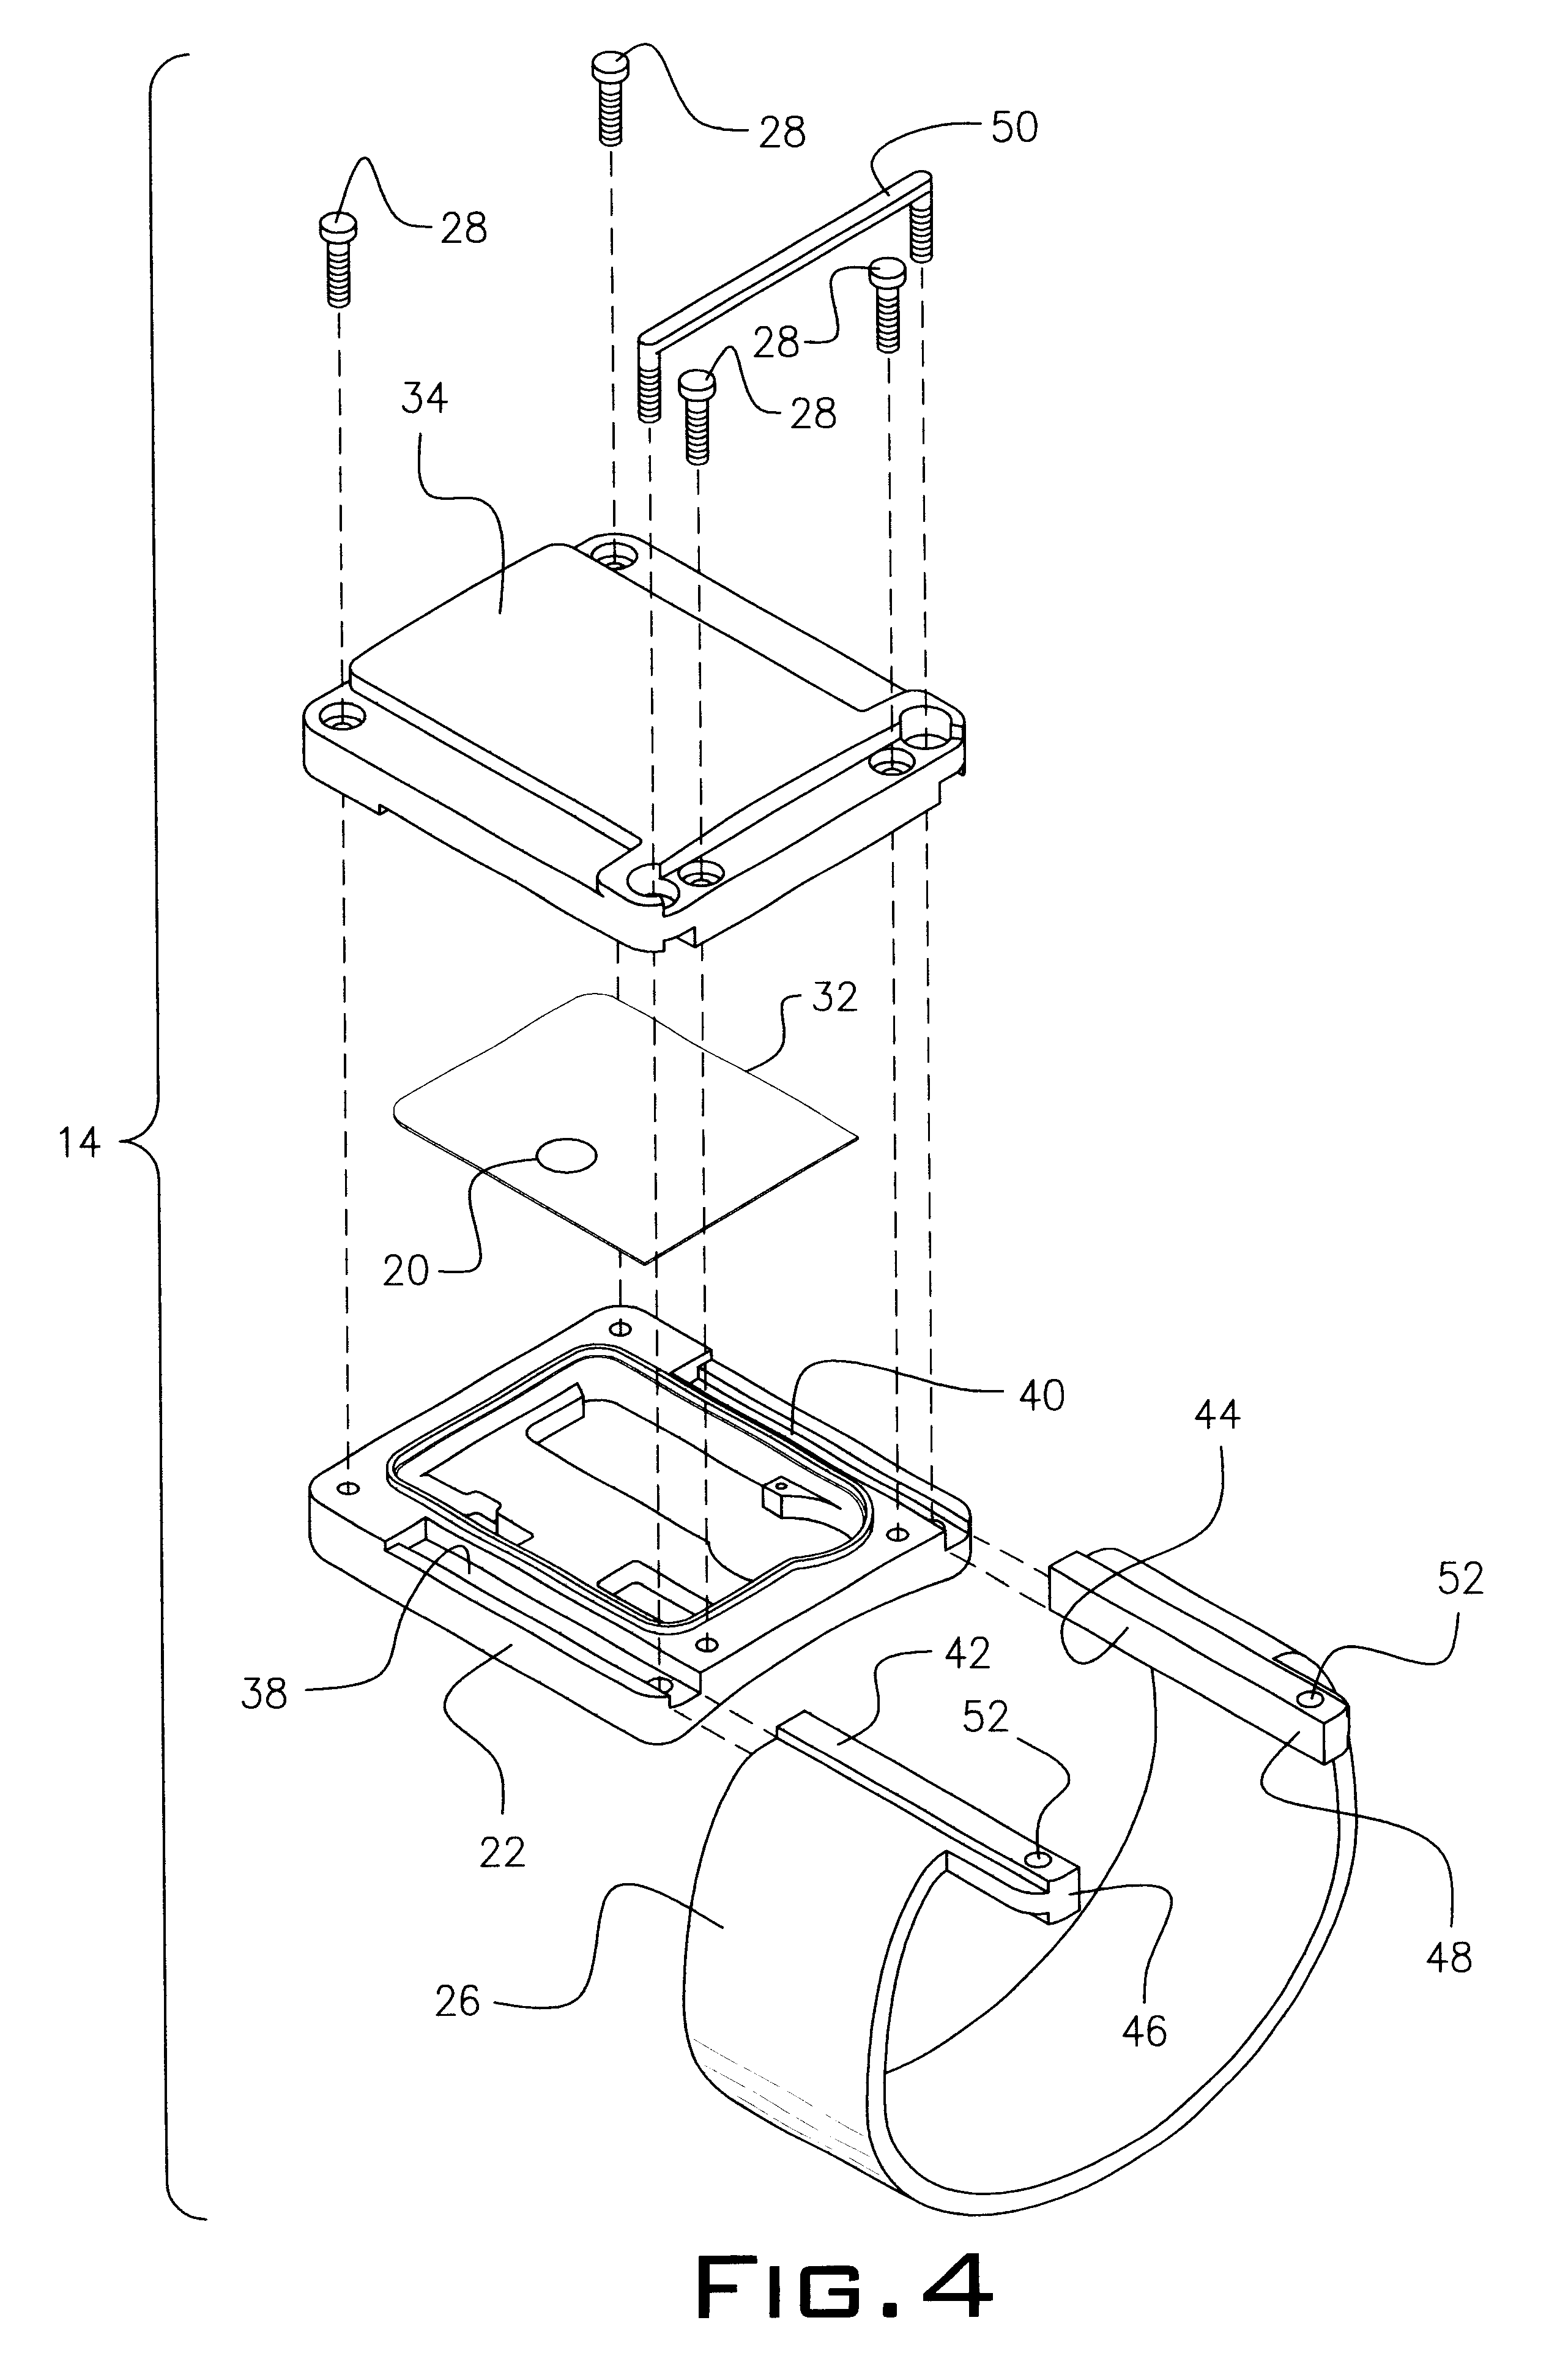 patent us6774799 - house arrest tracker system